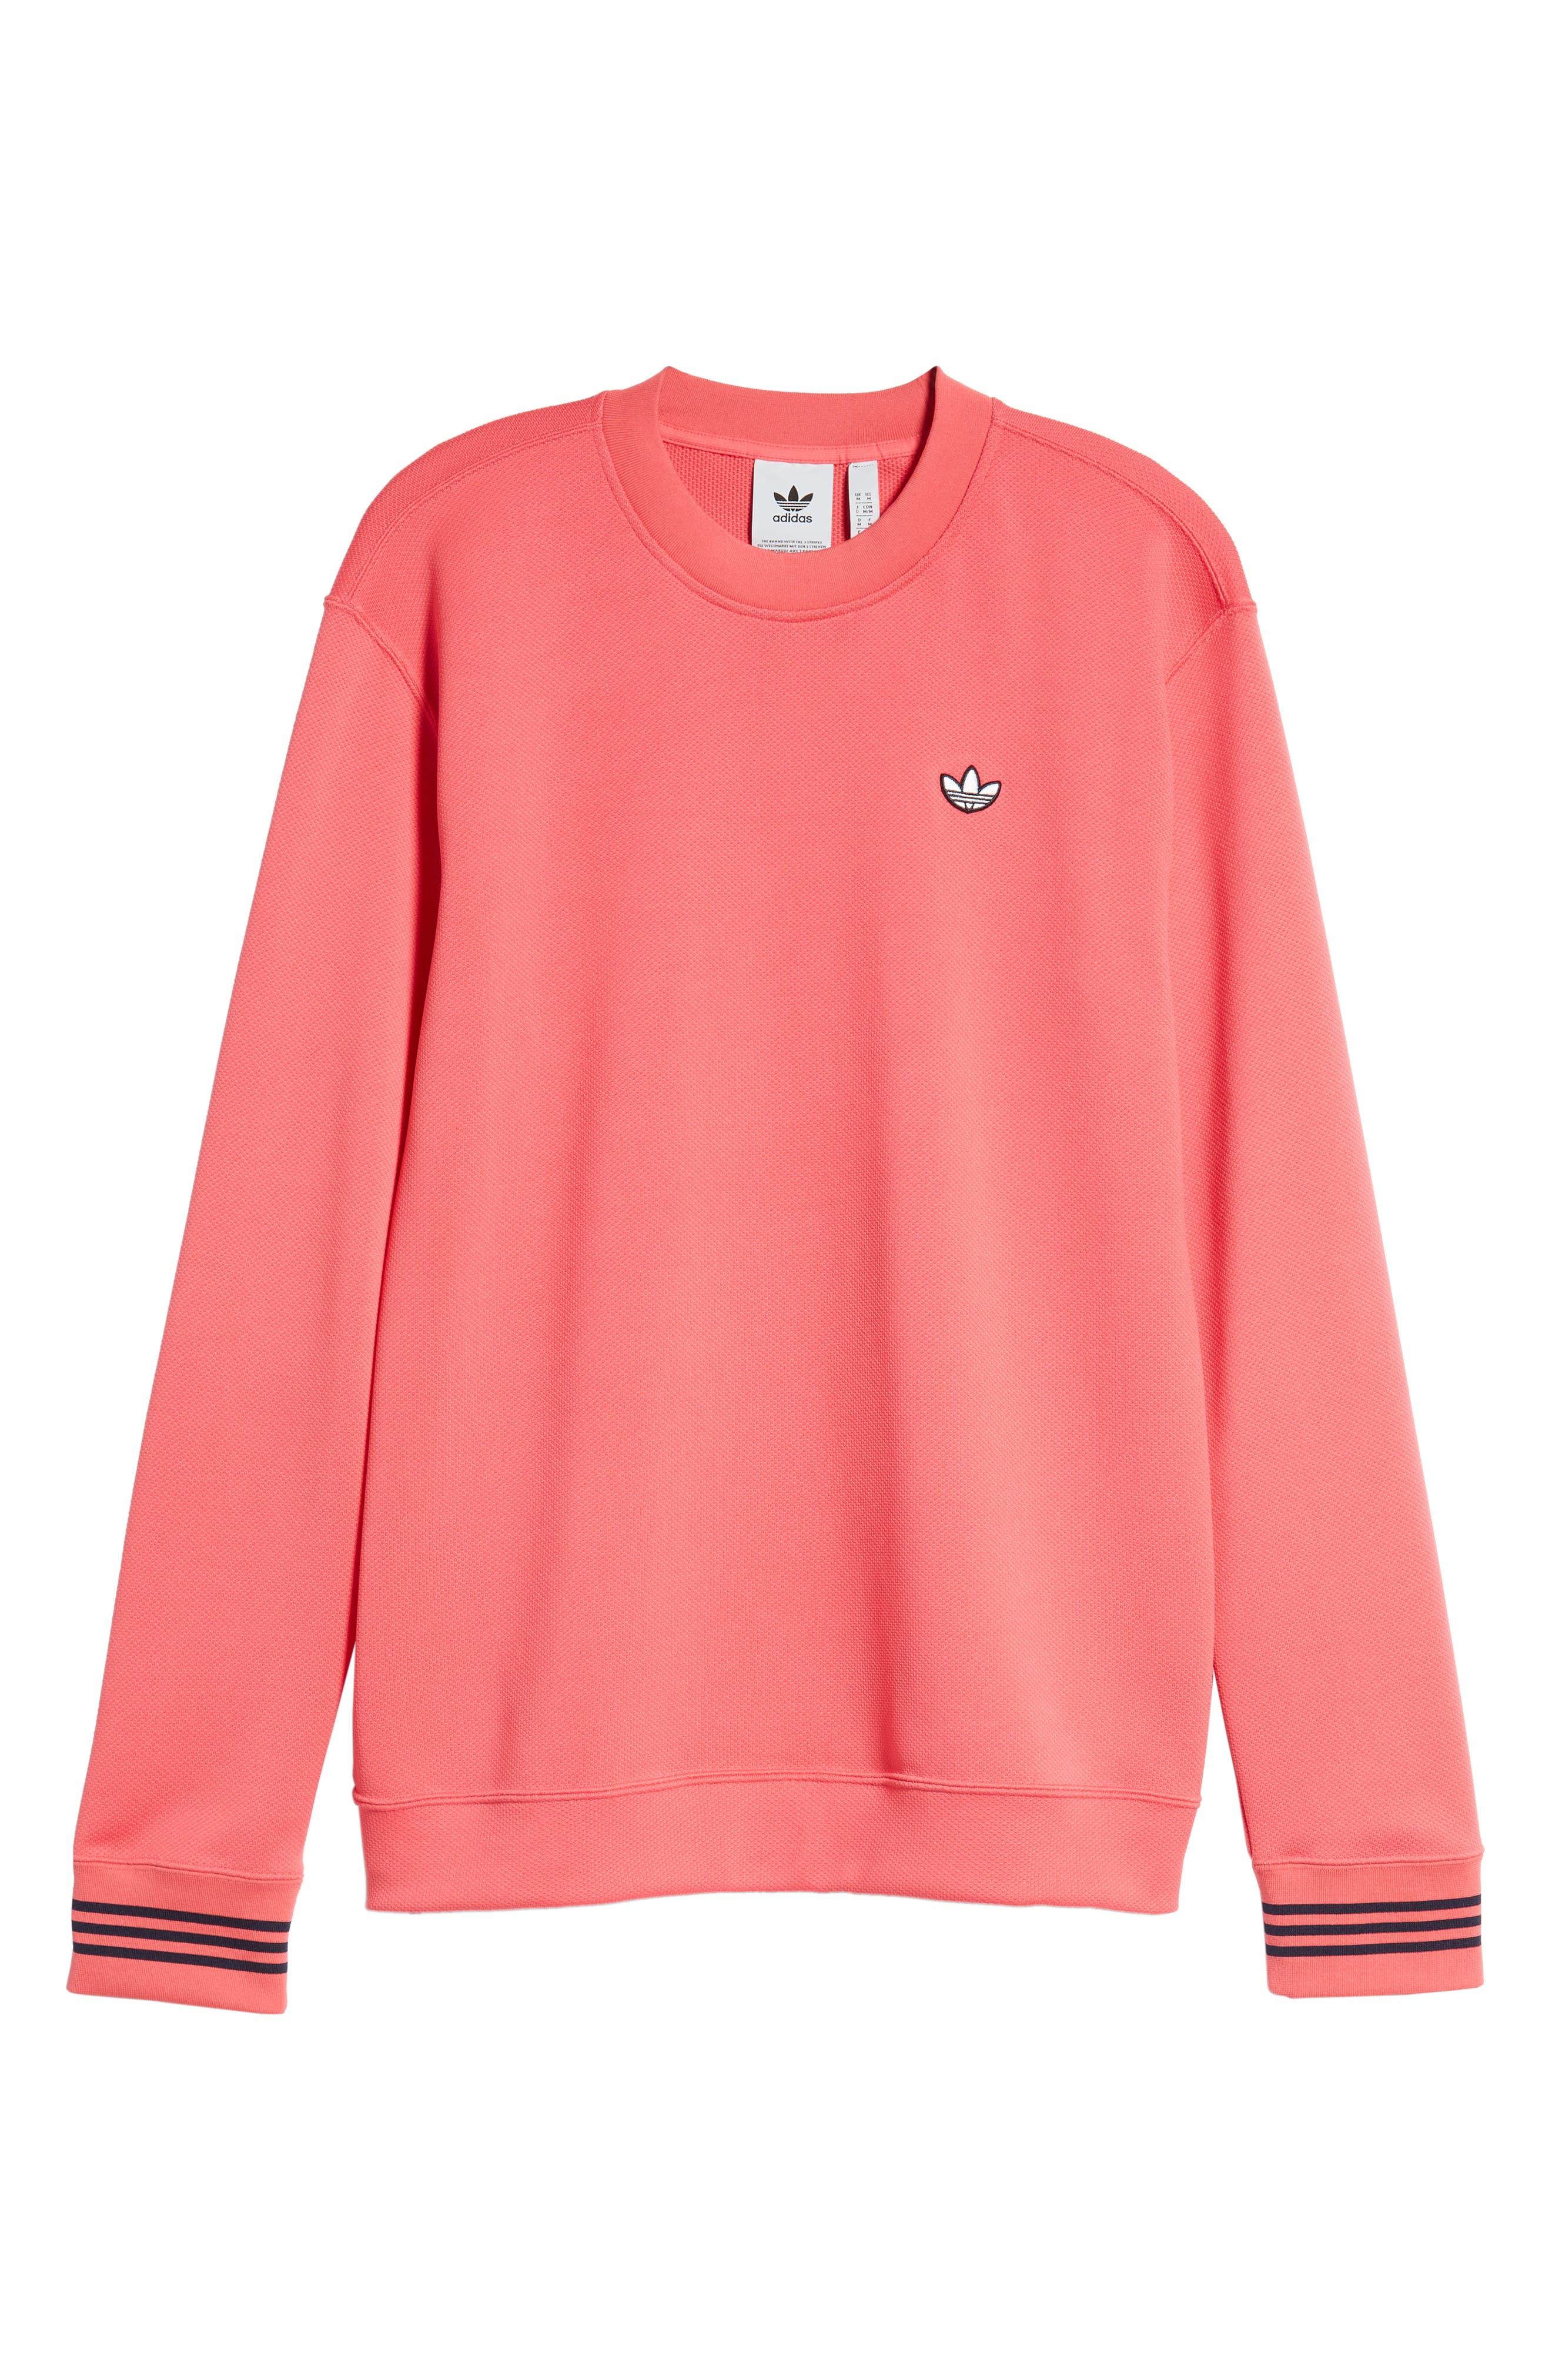 ADIDAS ORIGINALS, Piqué Long Sleeve T-Shirt, Alternate thumbnail 6, color, REAL PINK